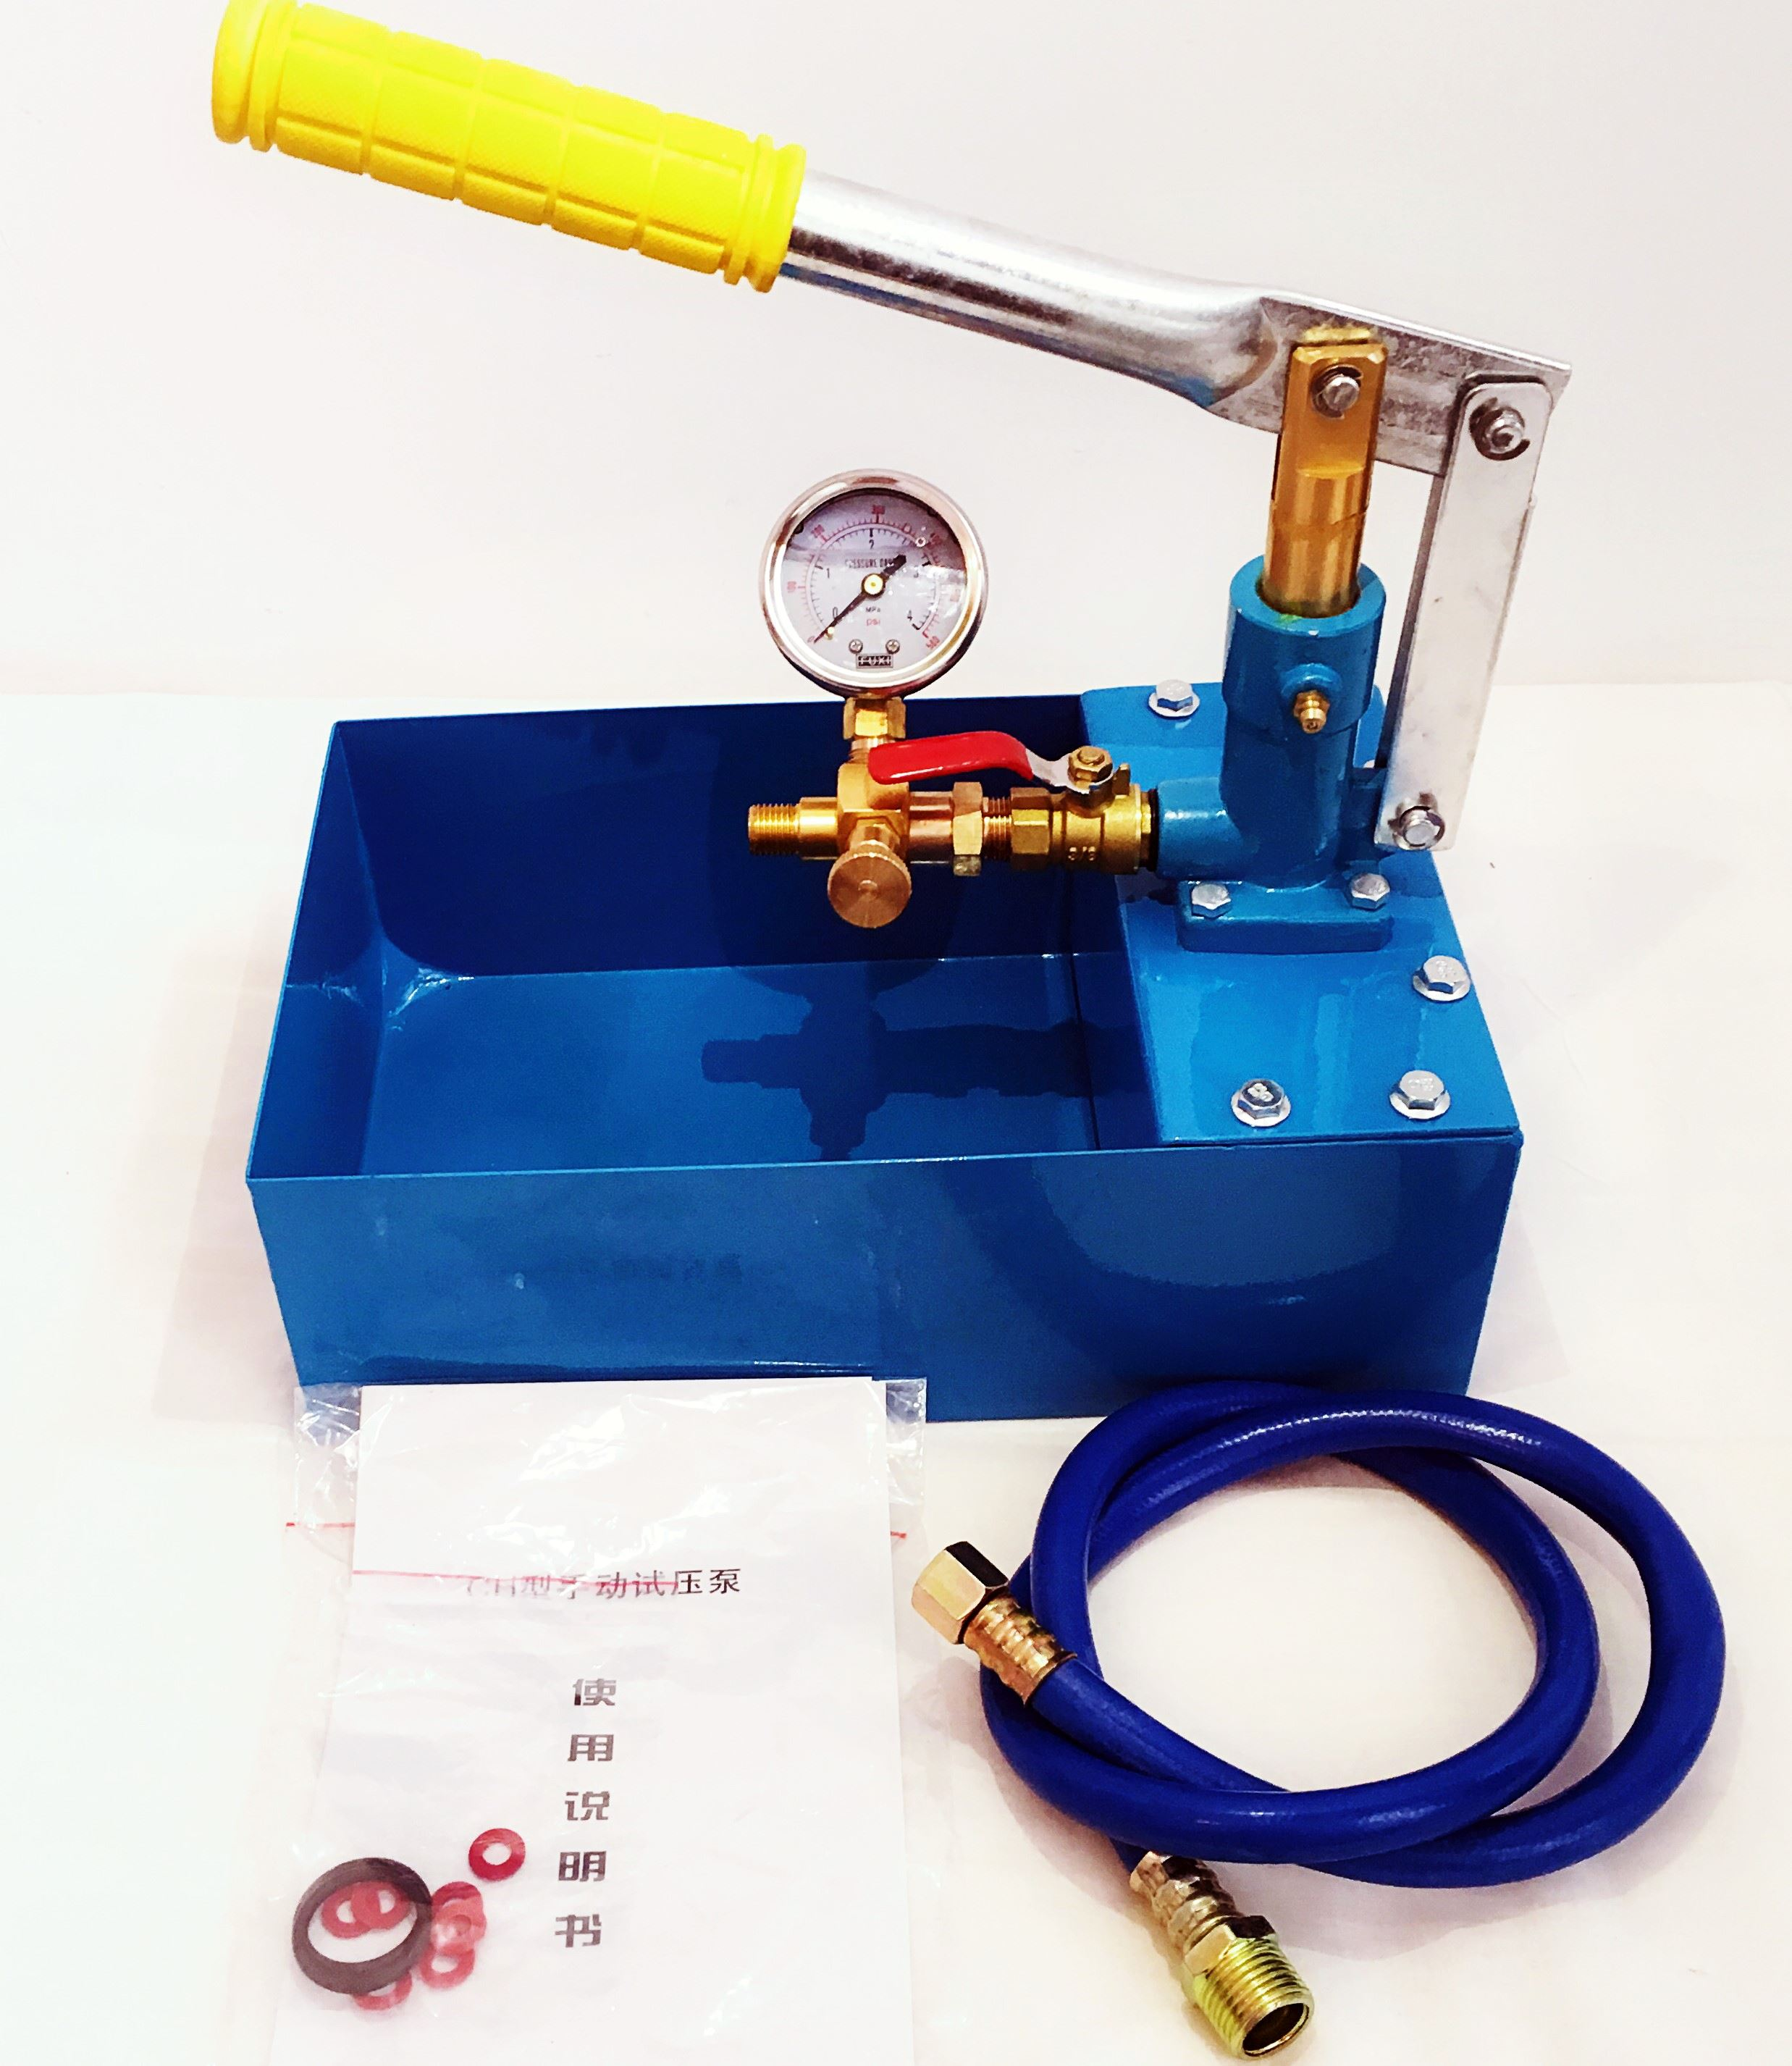 Pressure pump test pressure pump PPR pipe water pressure test pressure test pressure pump ground heating leak detector manual